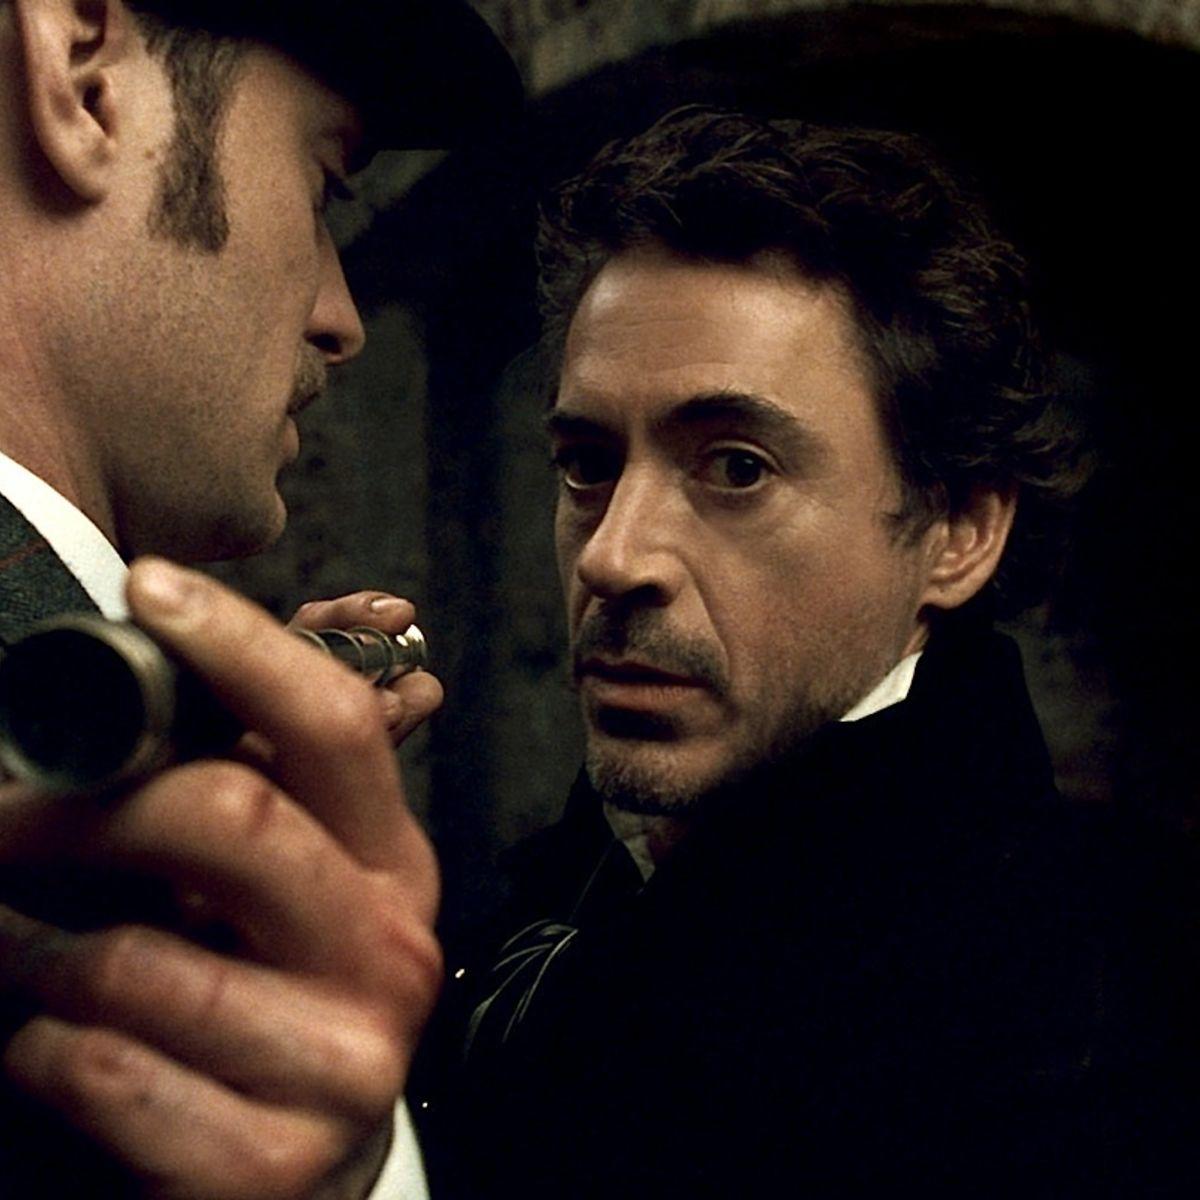 Robert-Downey-Jr-Jude-Law-Sherlock-Holmes.jpg